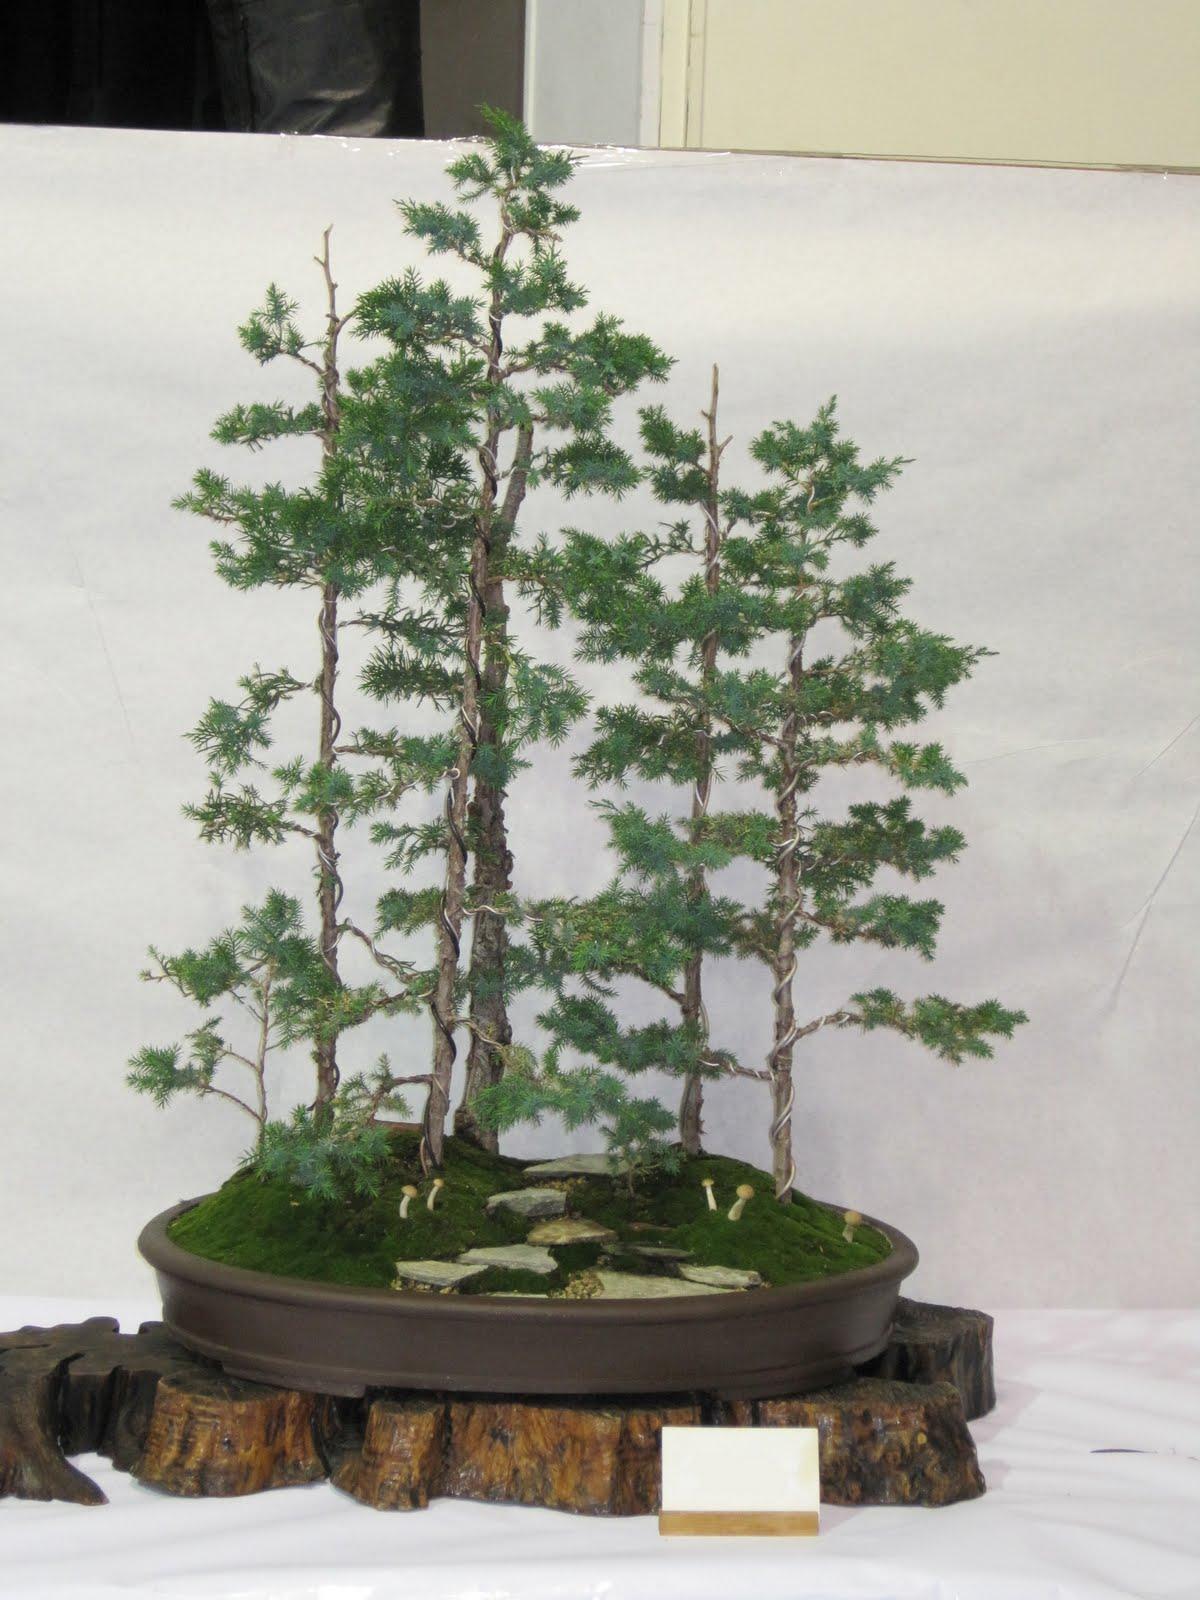 Shochiku Bai Bonsai Club Updated Bonsai Trees For Sale